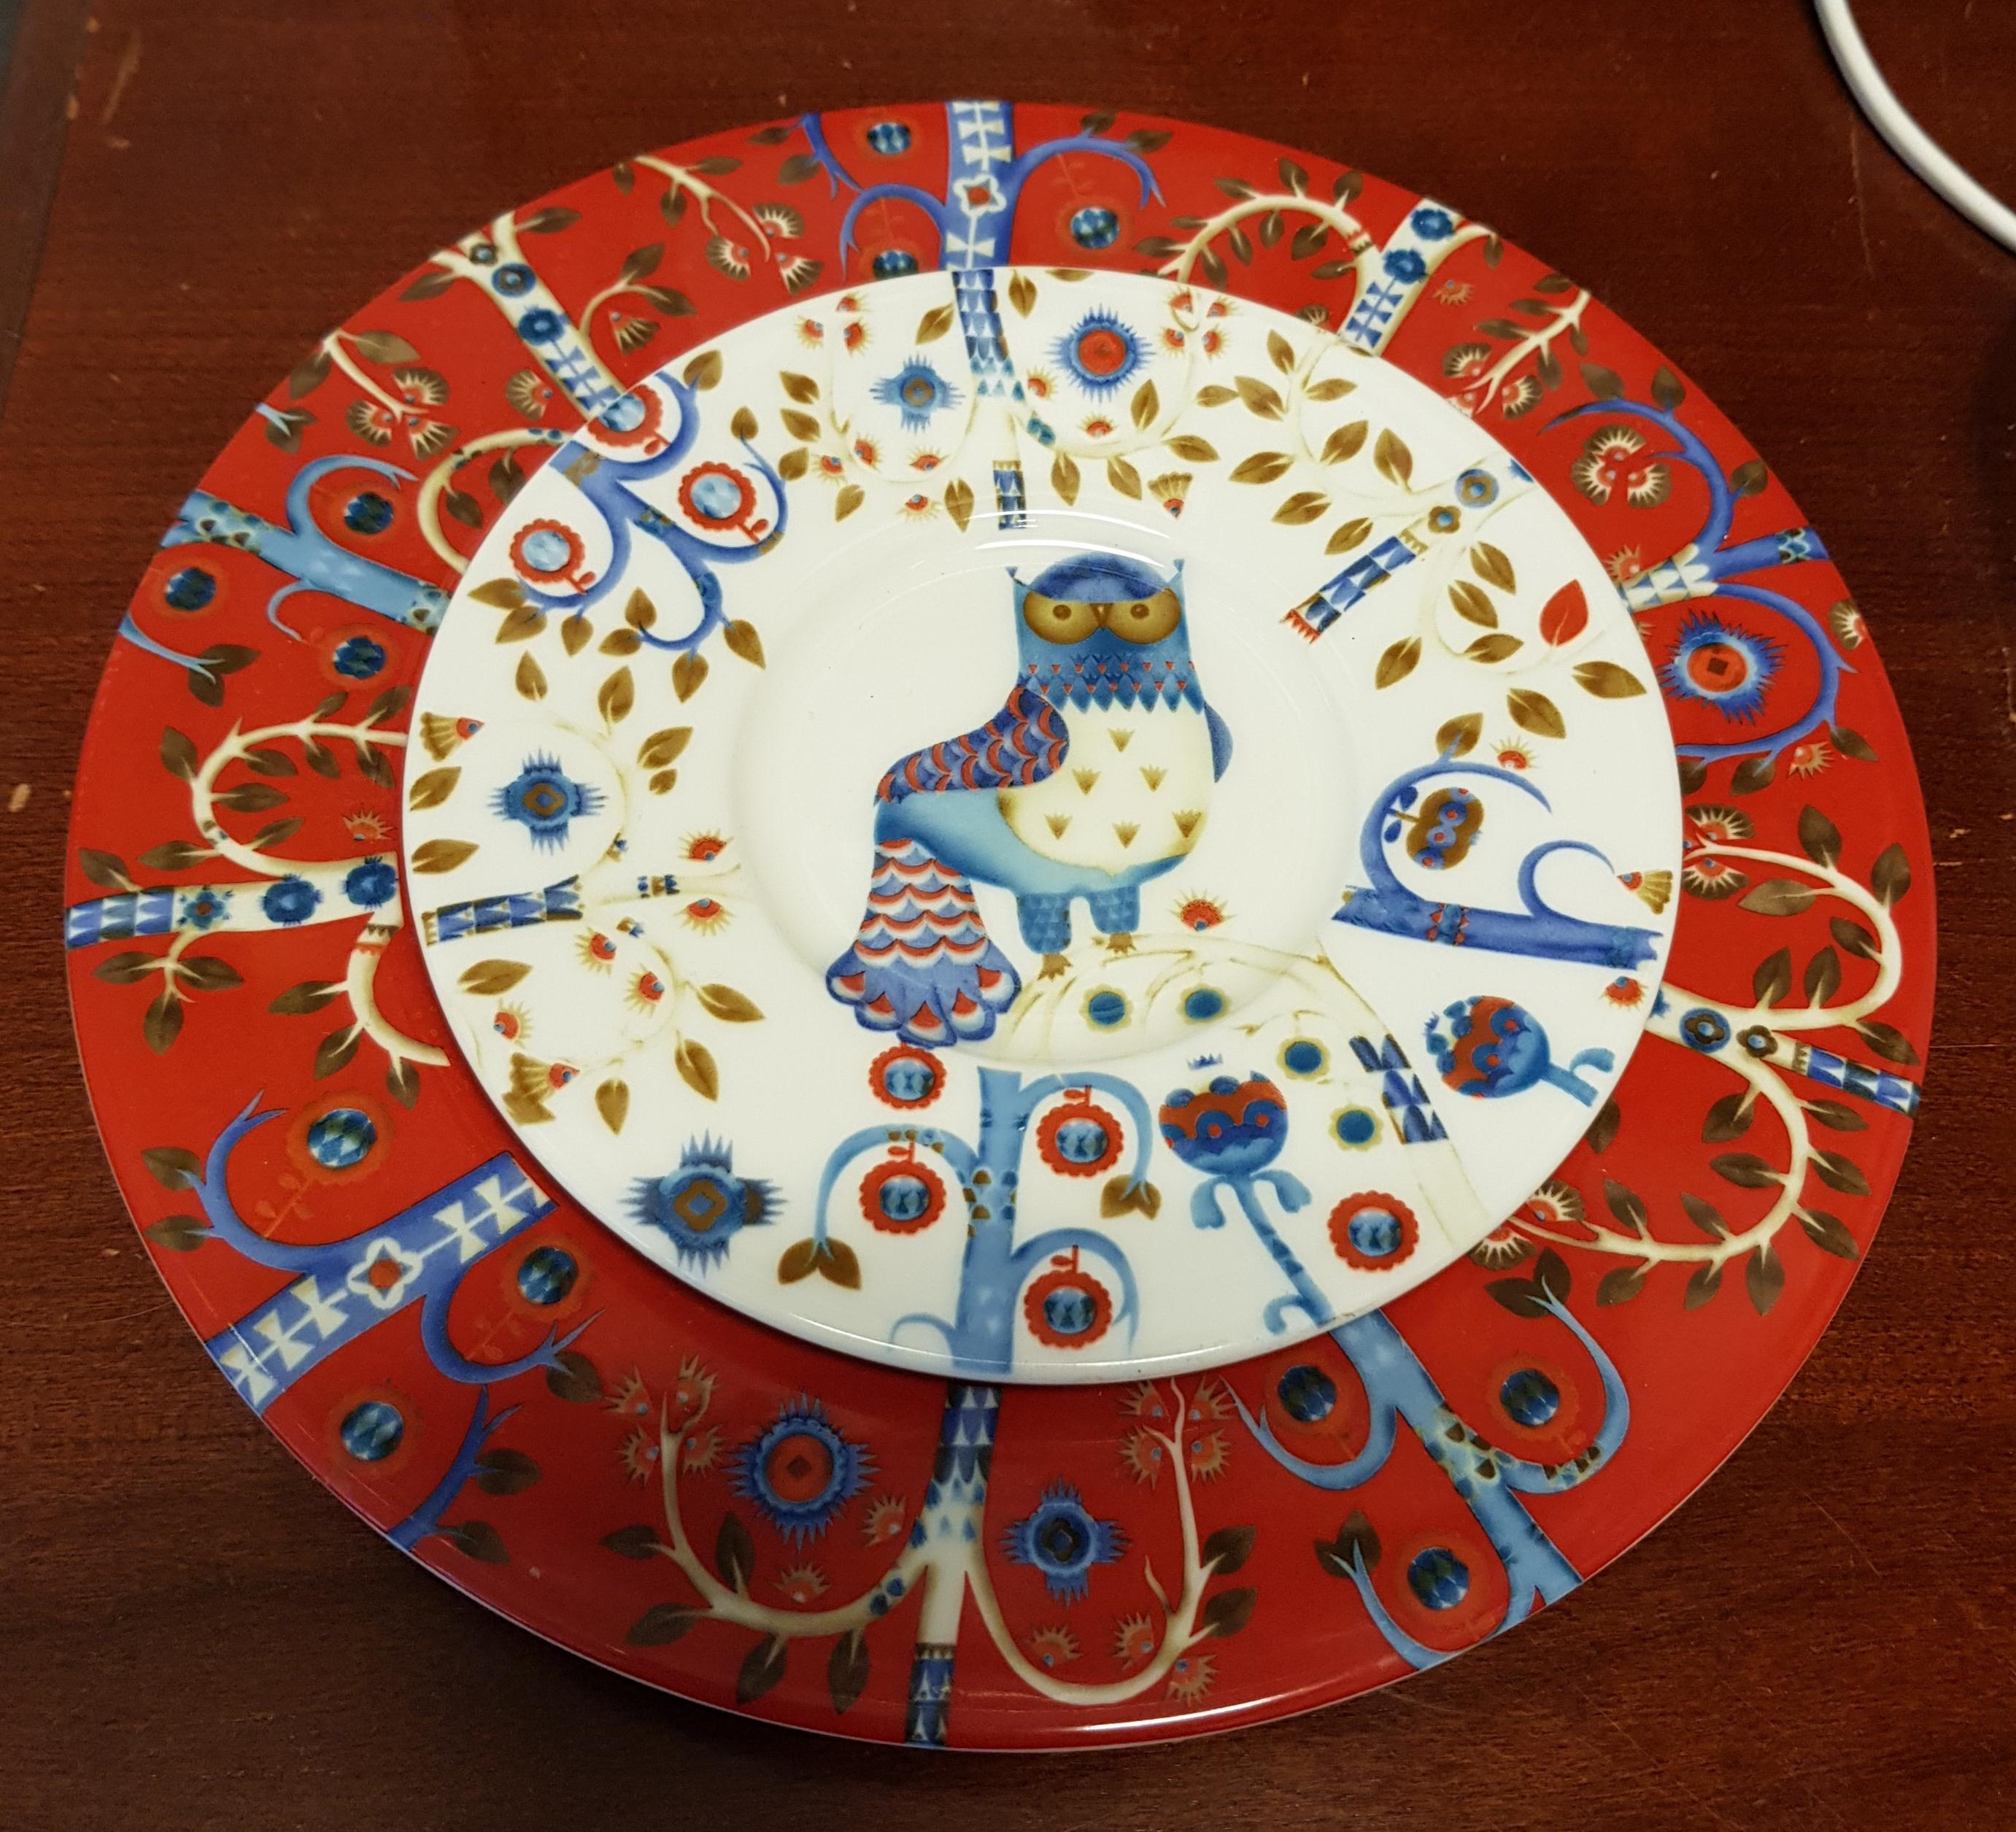 Arabia taika lautaset 2 kpl